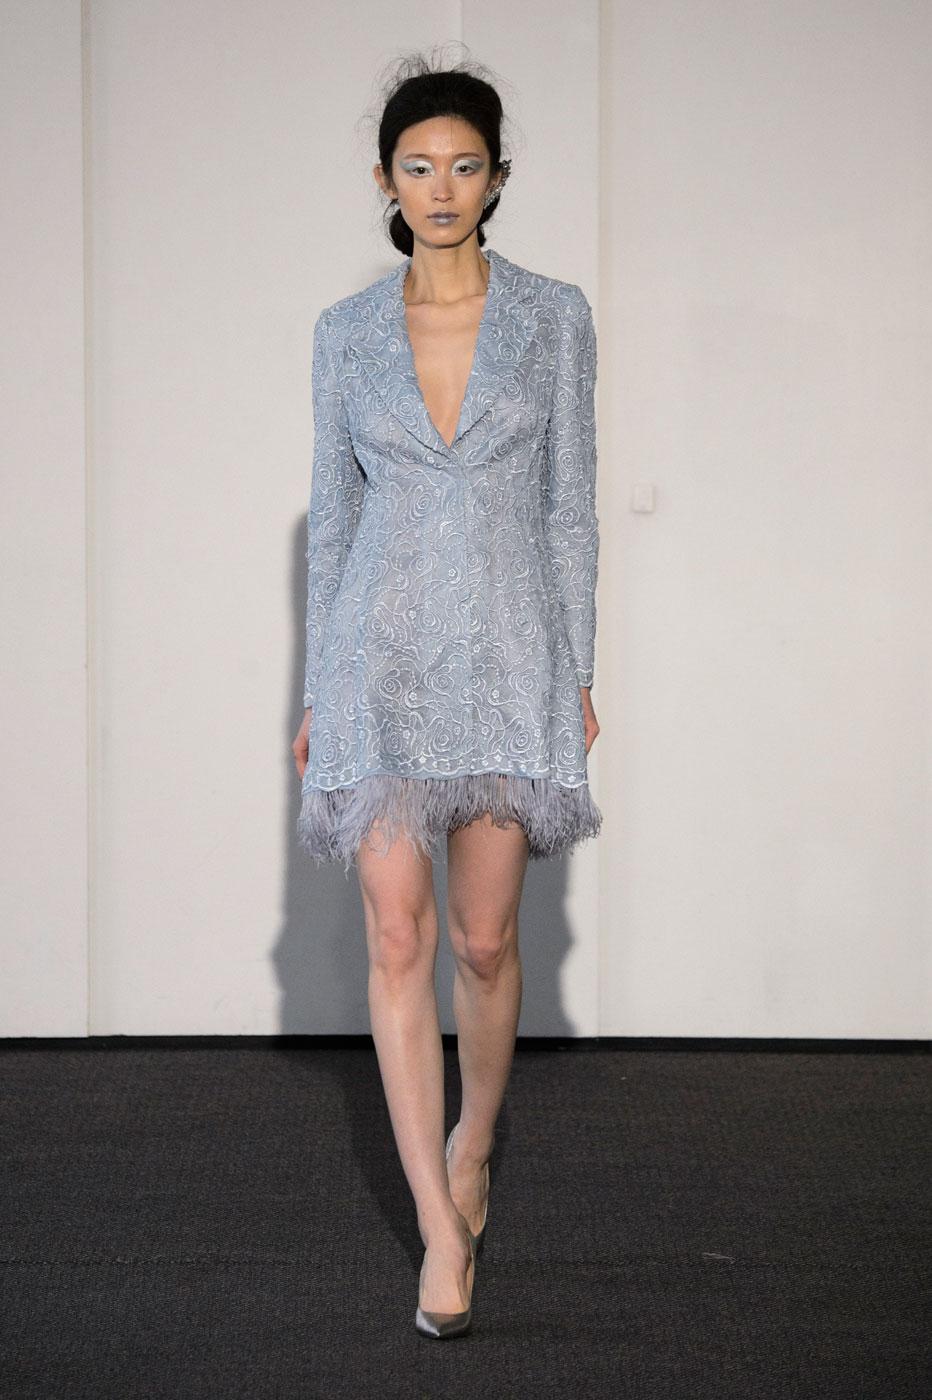 Busardi-fashion-runway-show-haute-couture-paris-spring-2015-the-impression-01